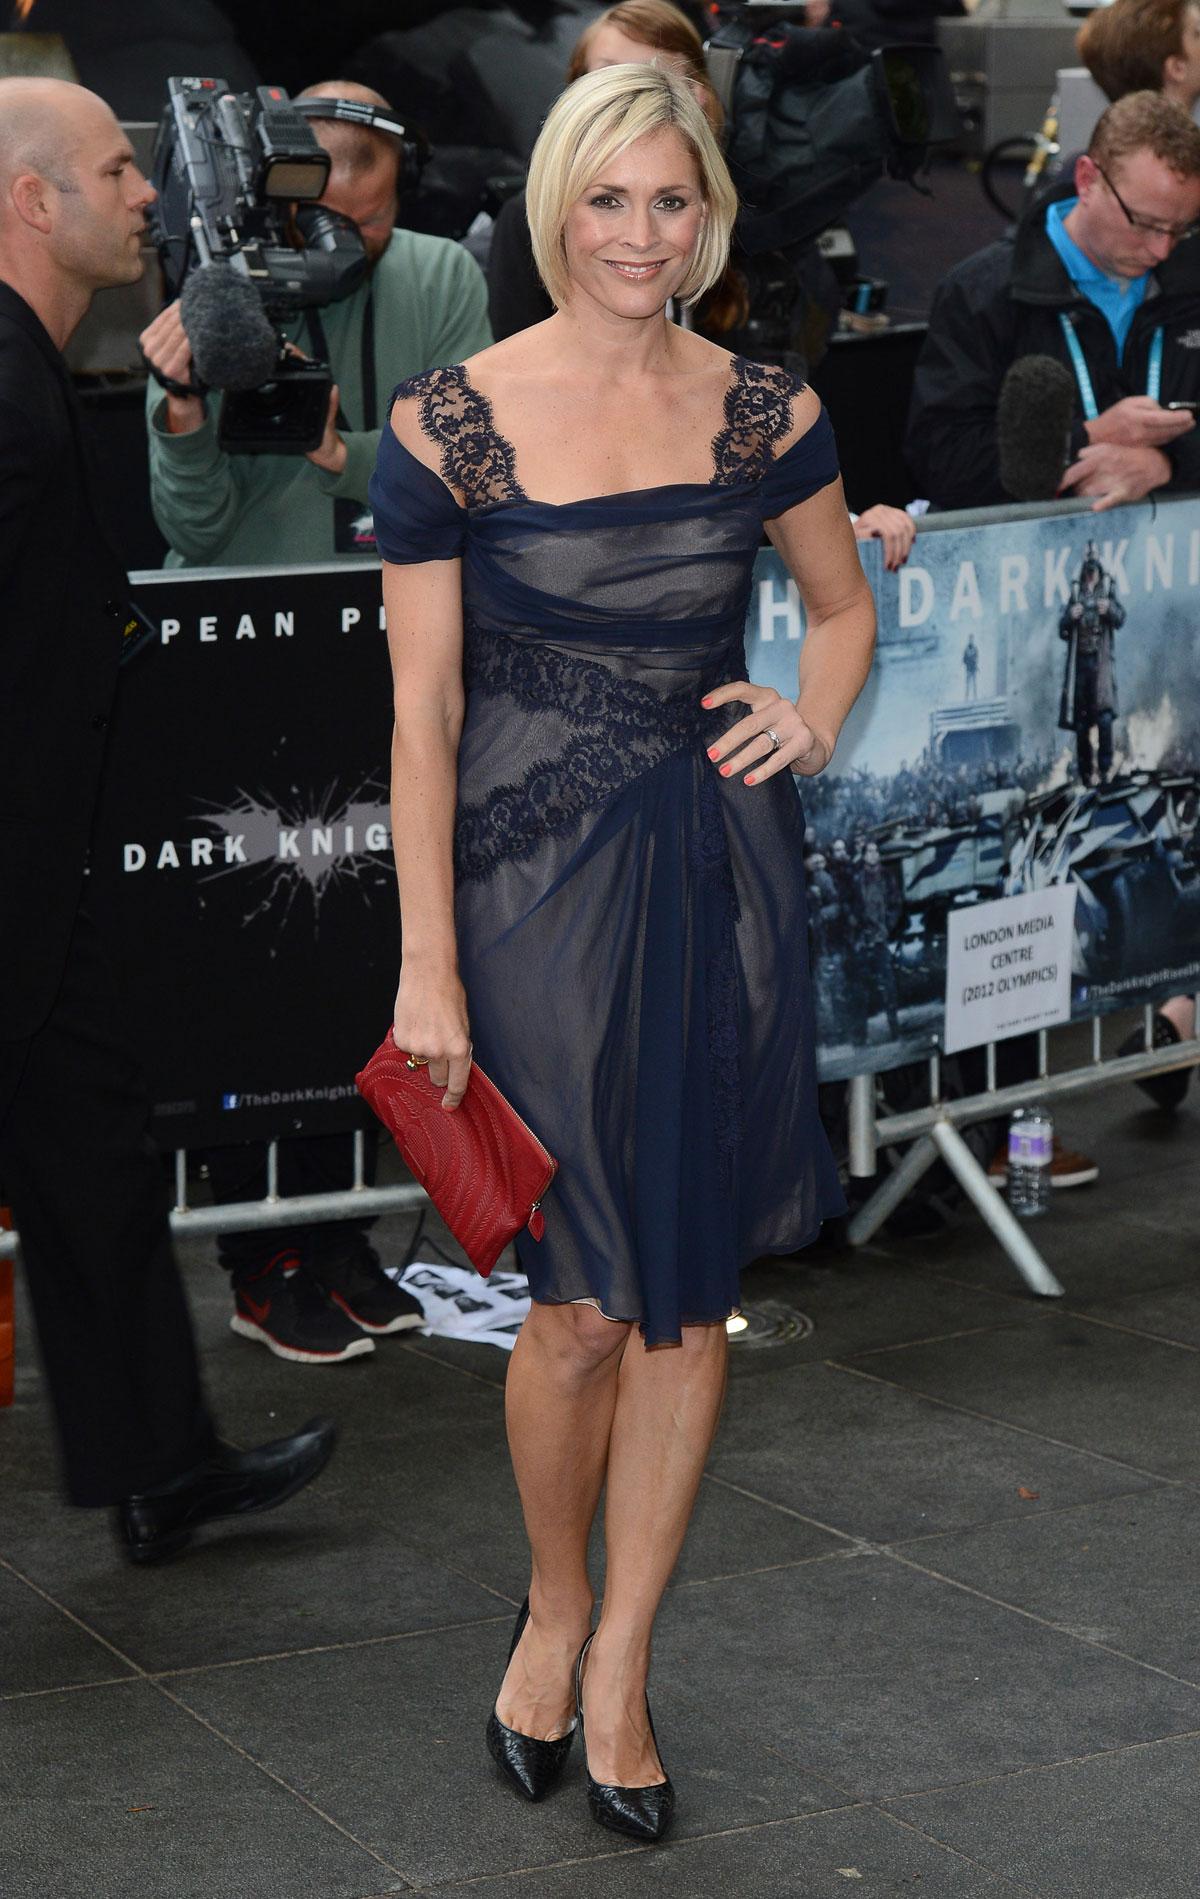 jenni falconer at the dark knight rises premiere in london